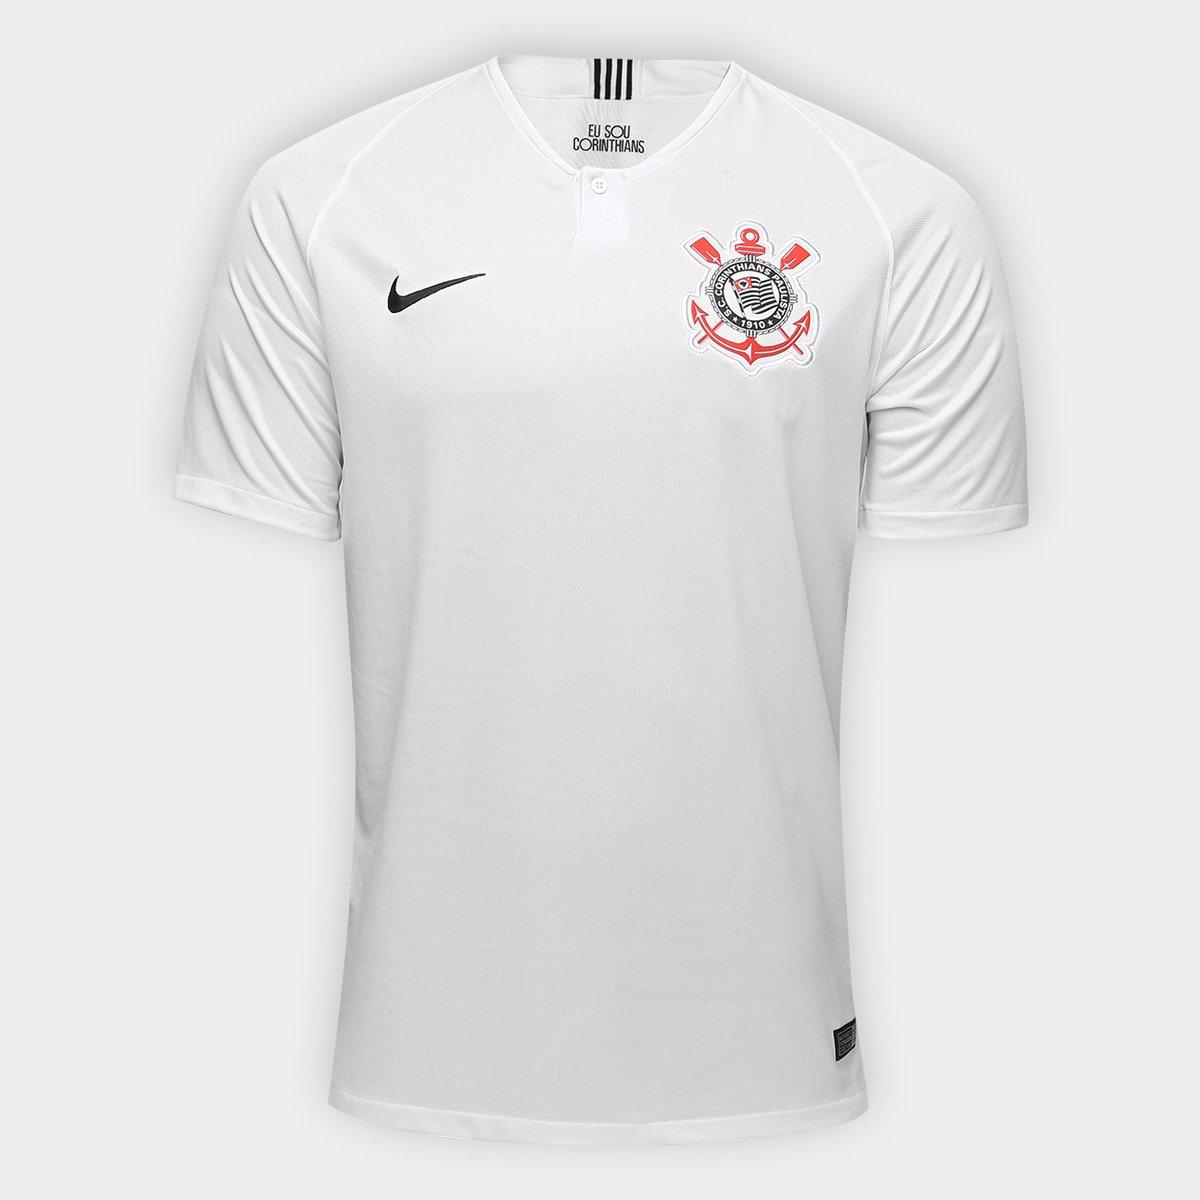 376dc09884d12 Camisa Corinthians I 18 19 s n° Torcedor Nike Masculina - Branco e Preto -  Compre Agora